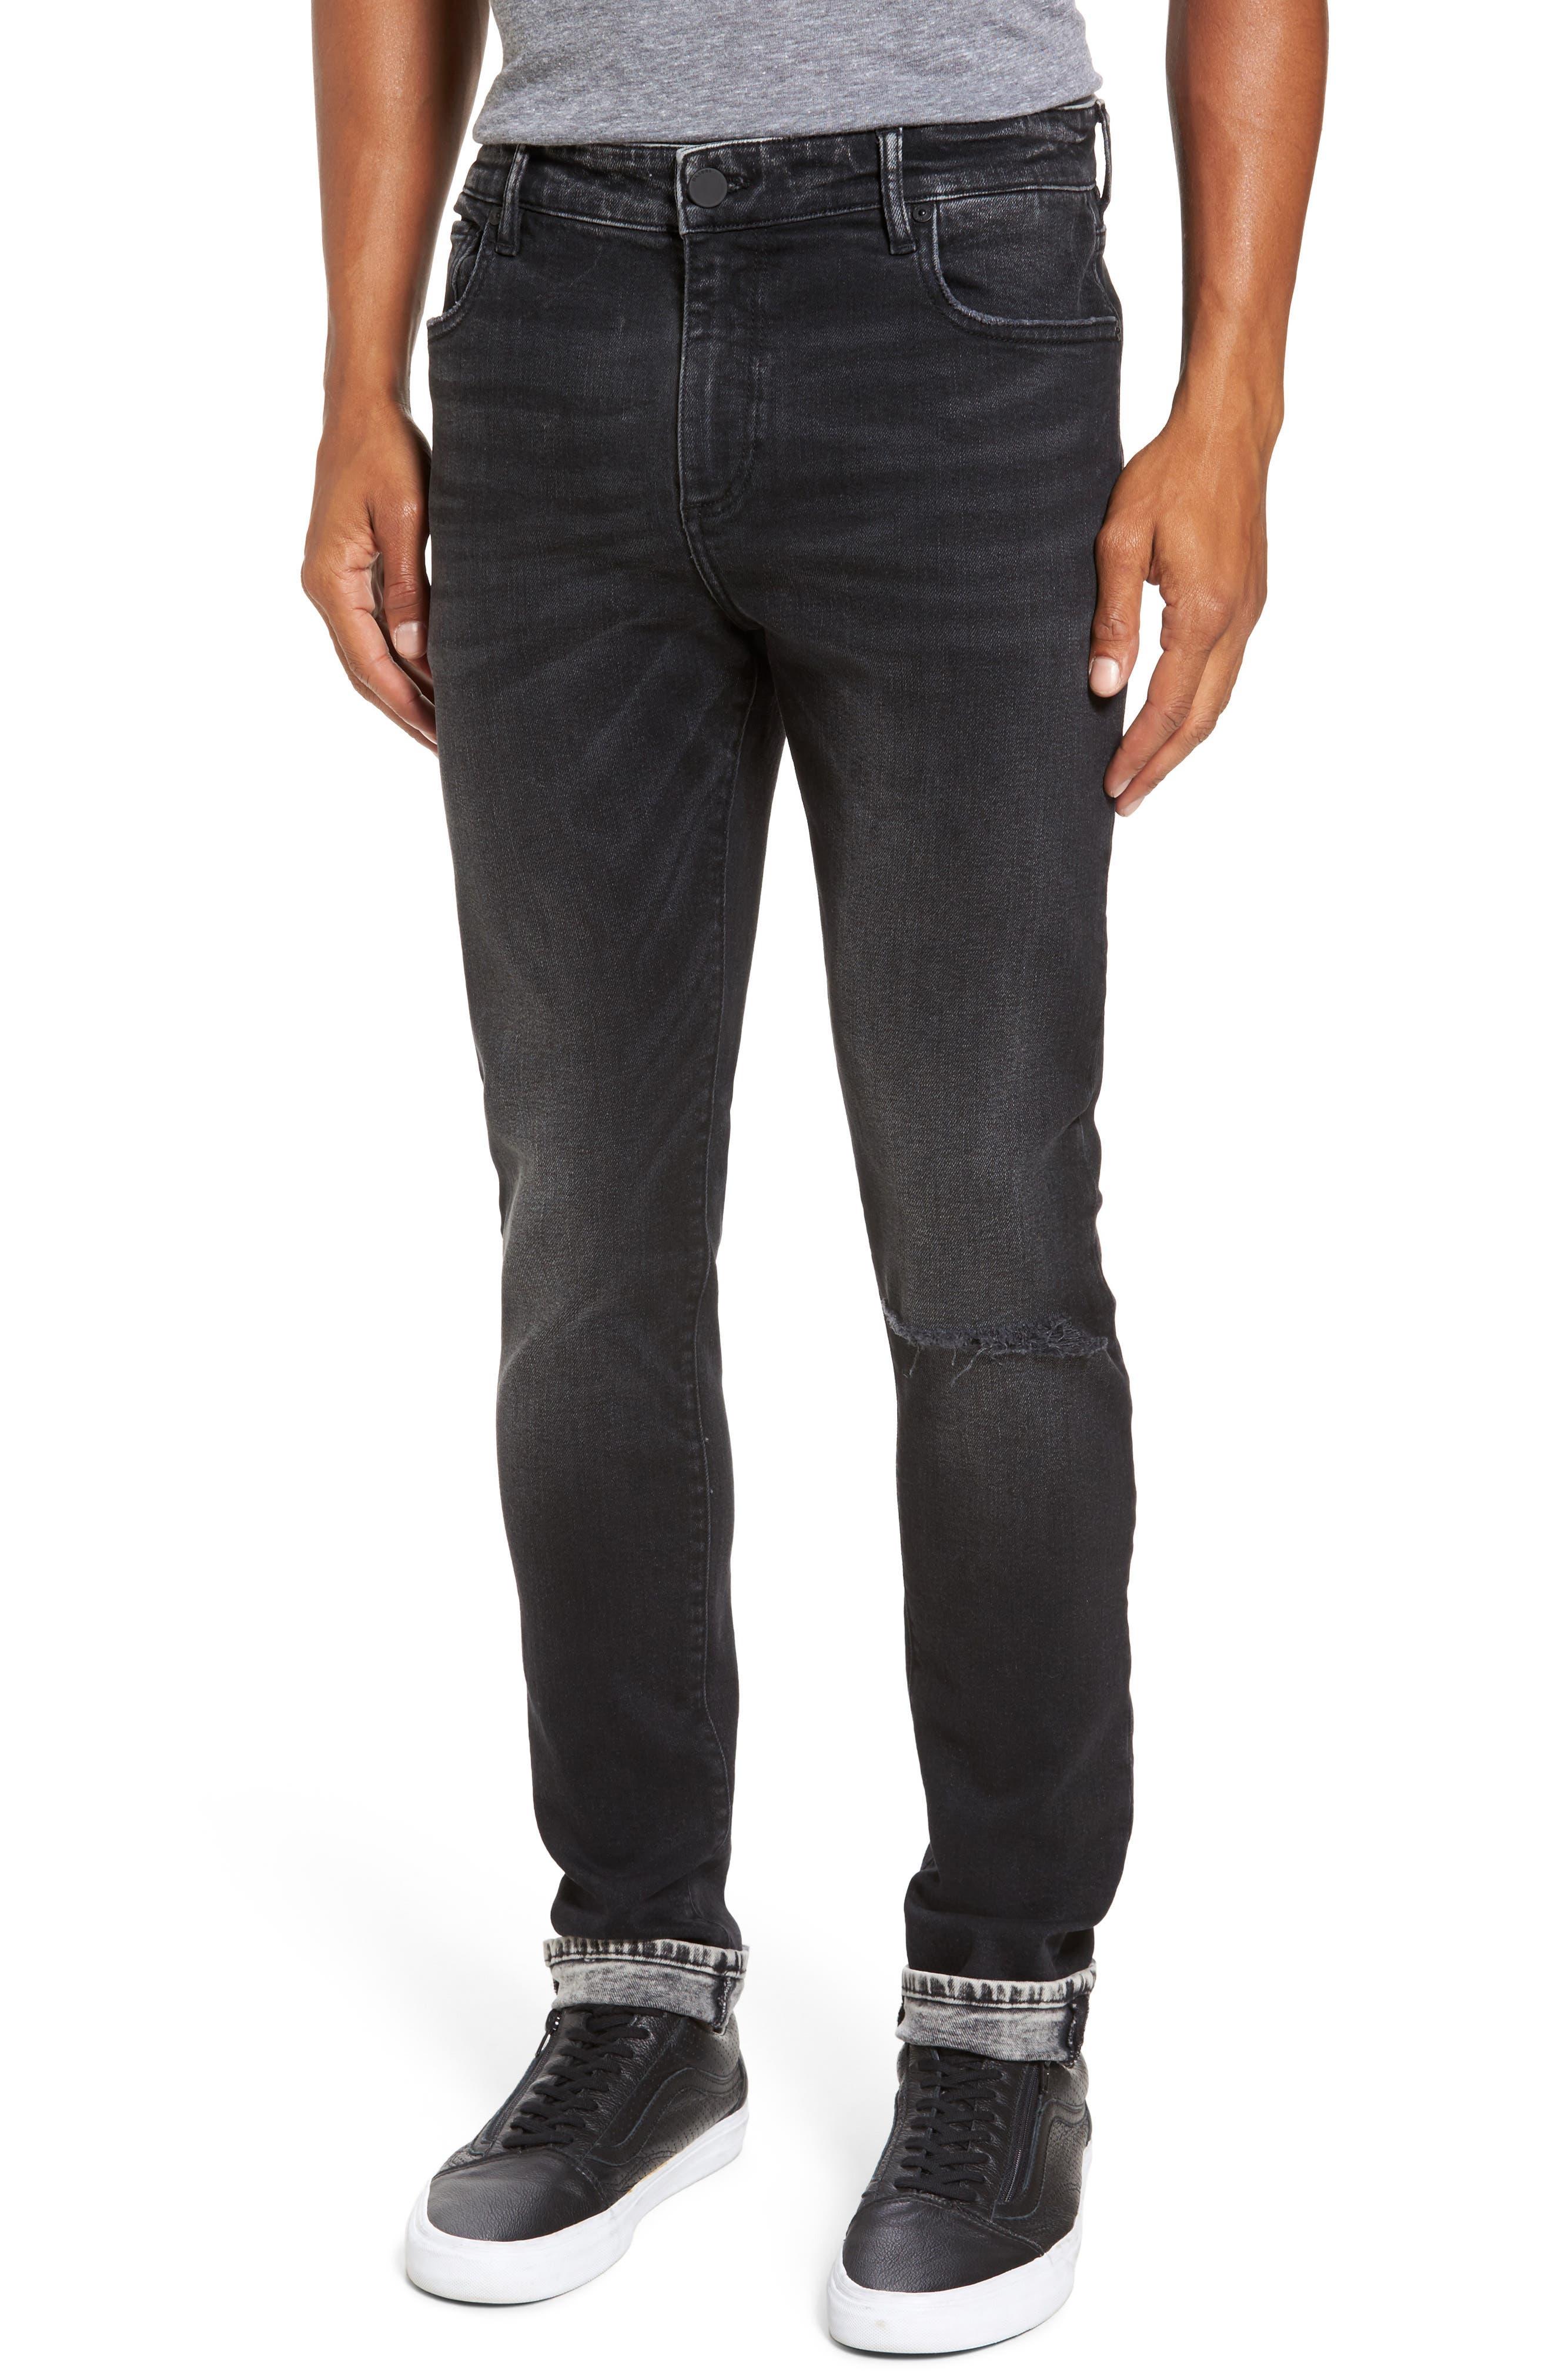 Alternate Image 1 Selected - DL1961 Hunter Skinny Jeans (Argon)